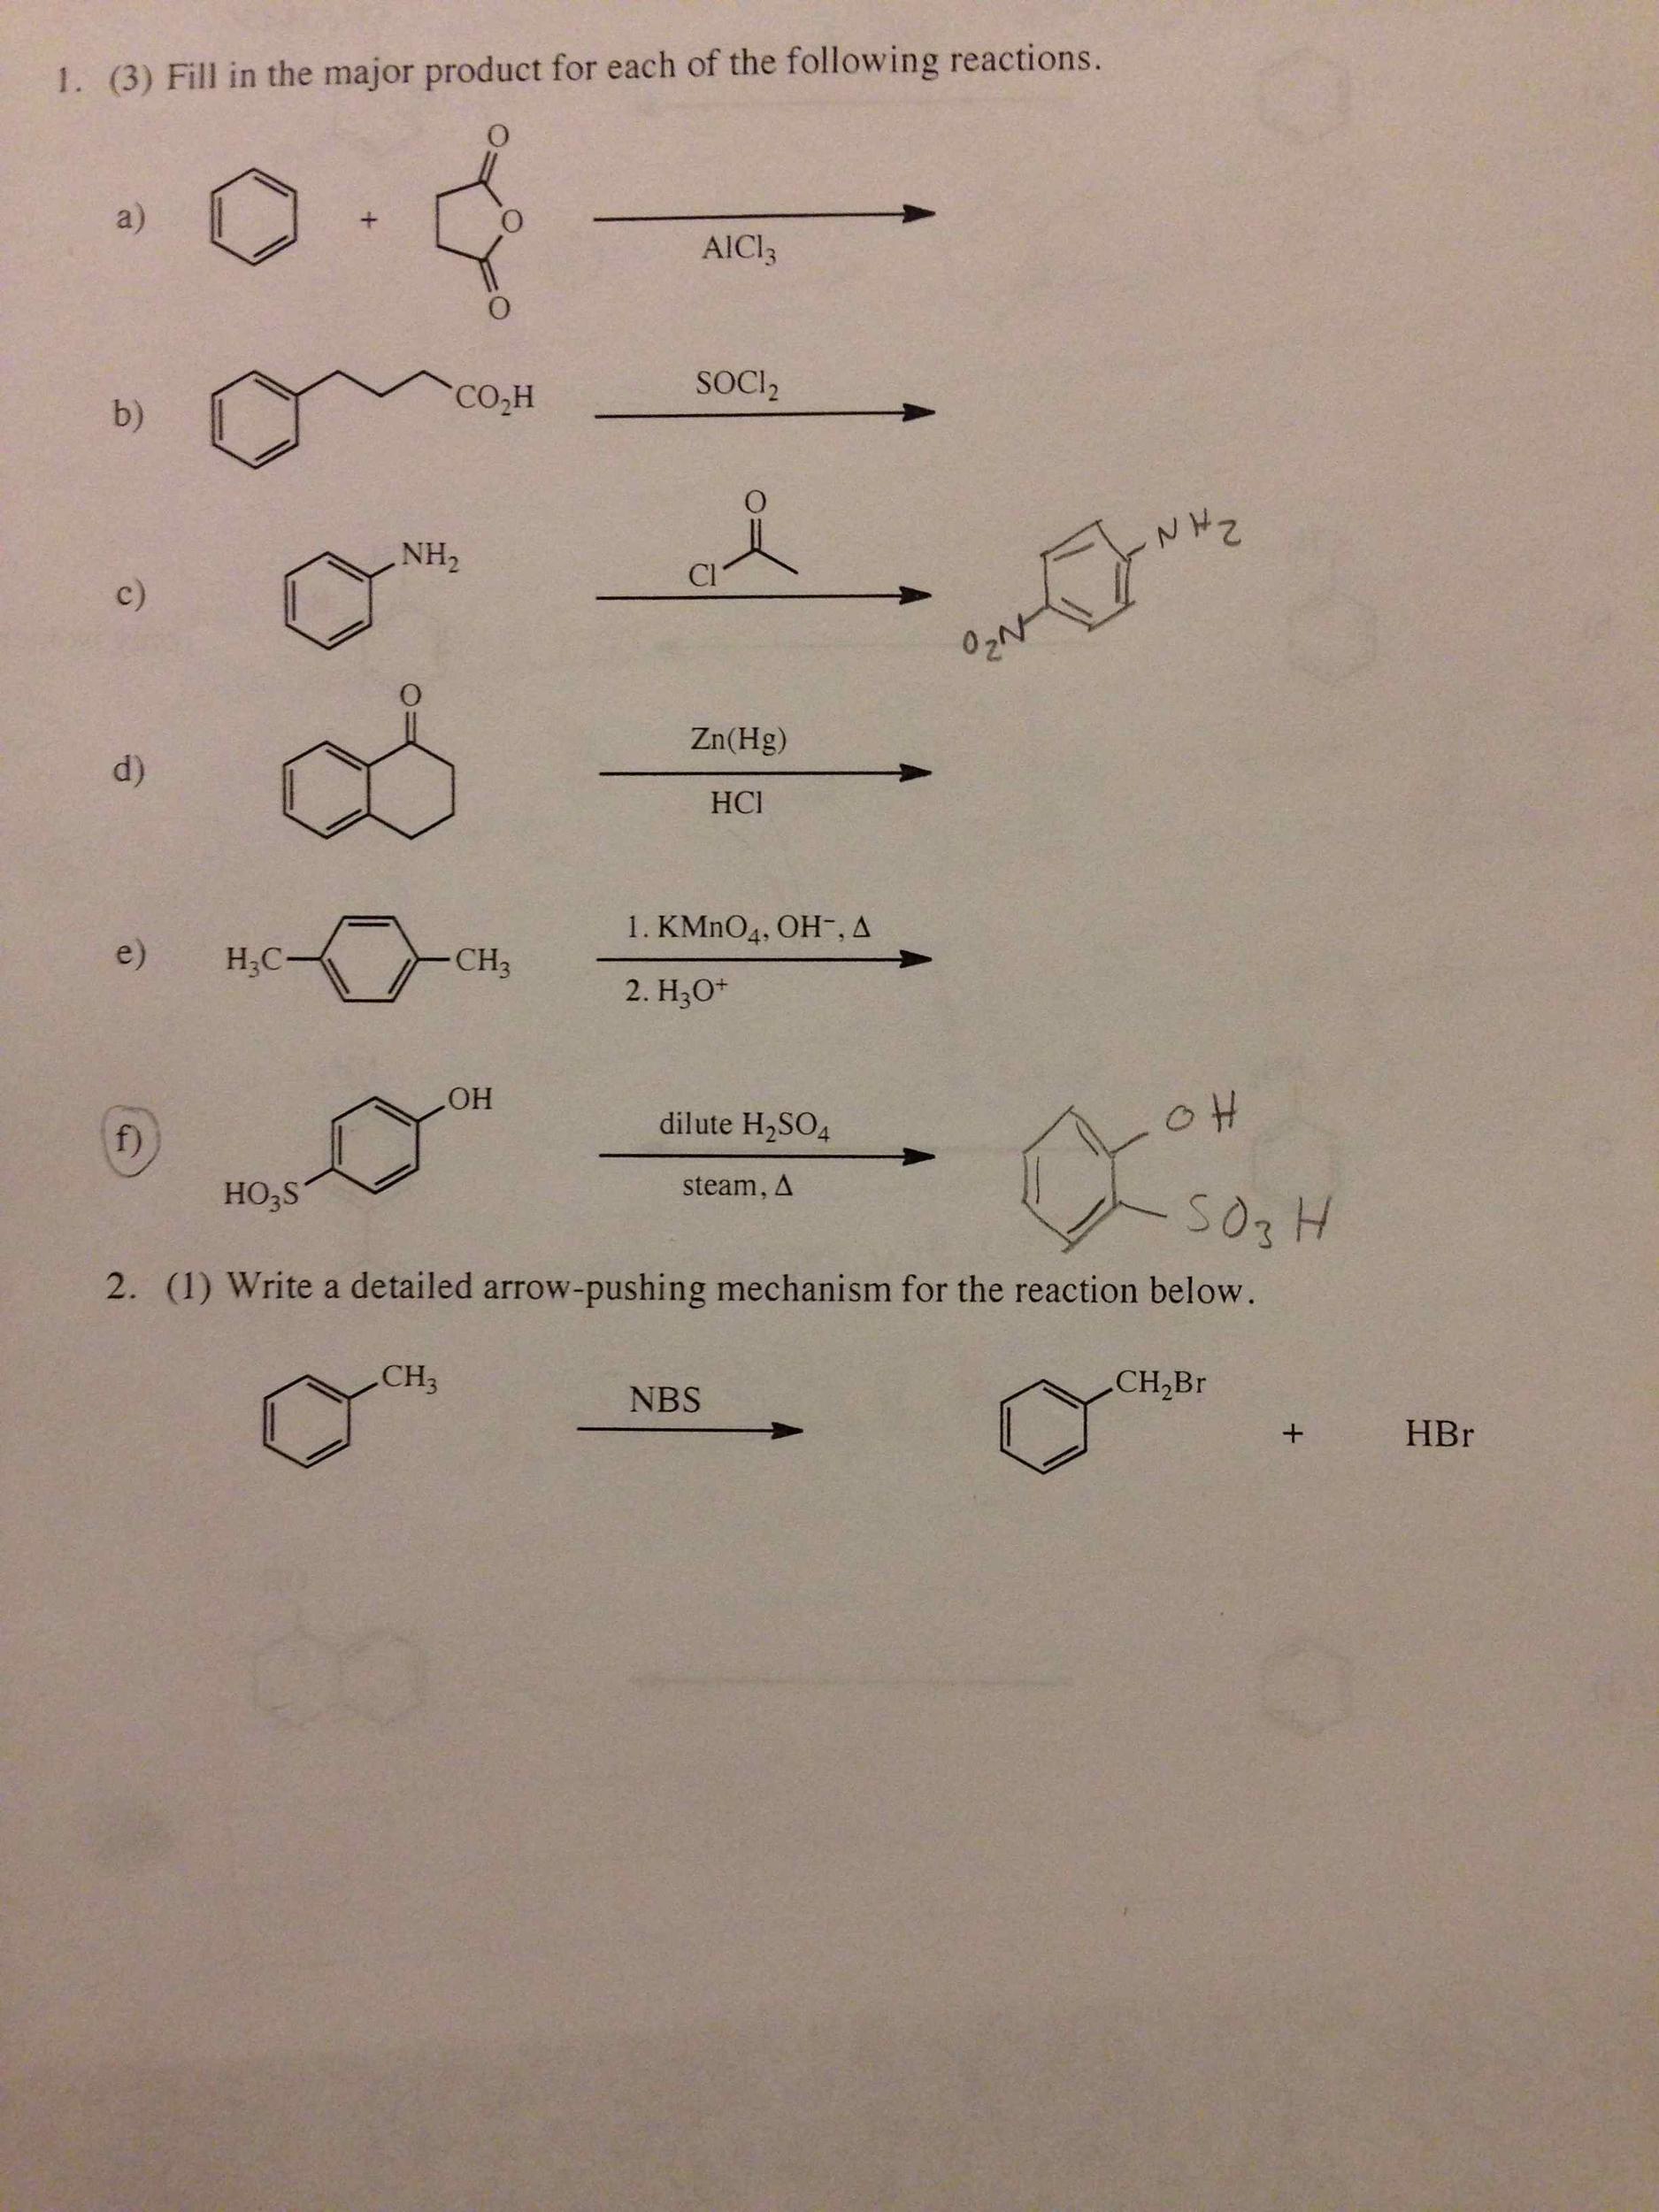 dehydrohalogenation